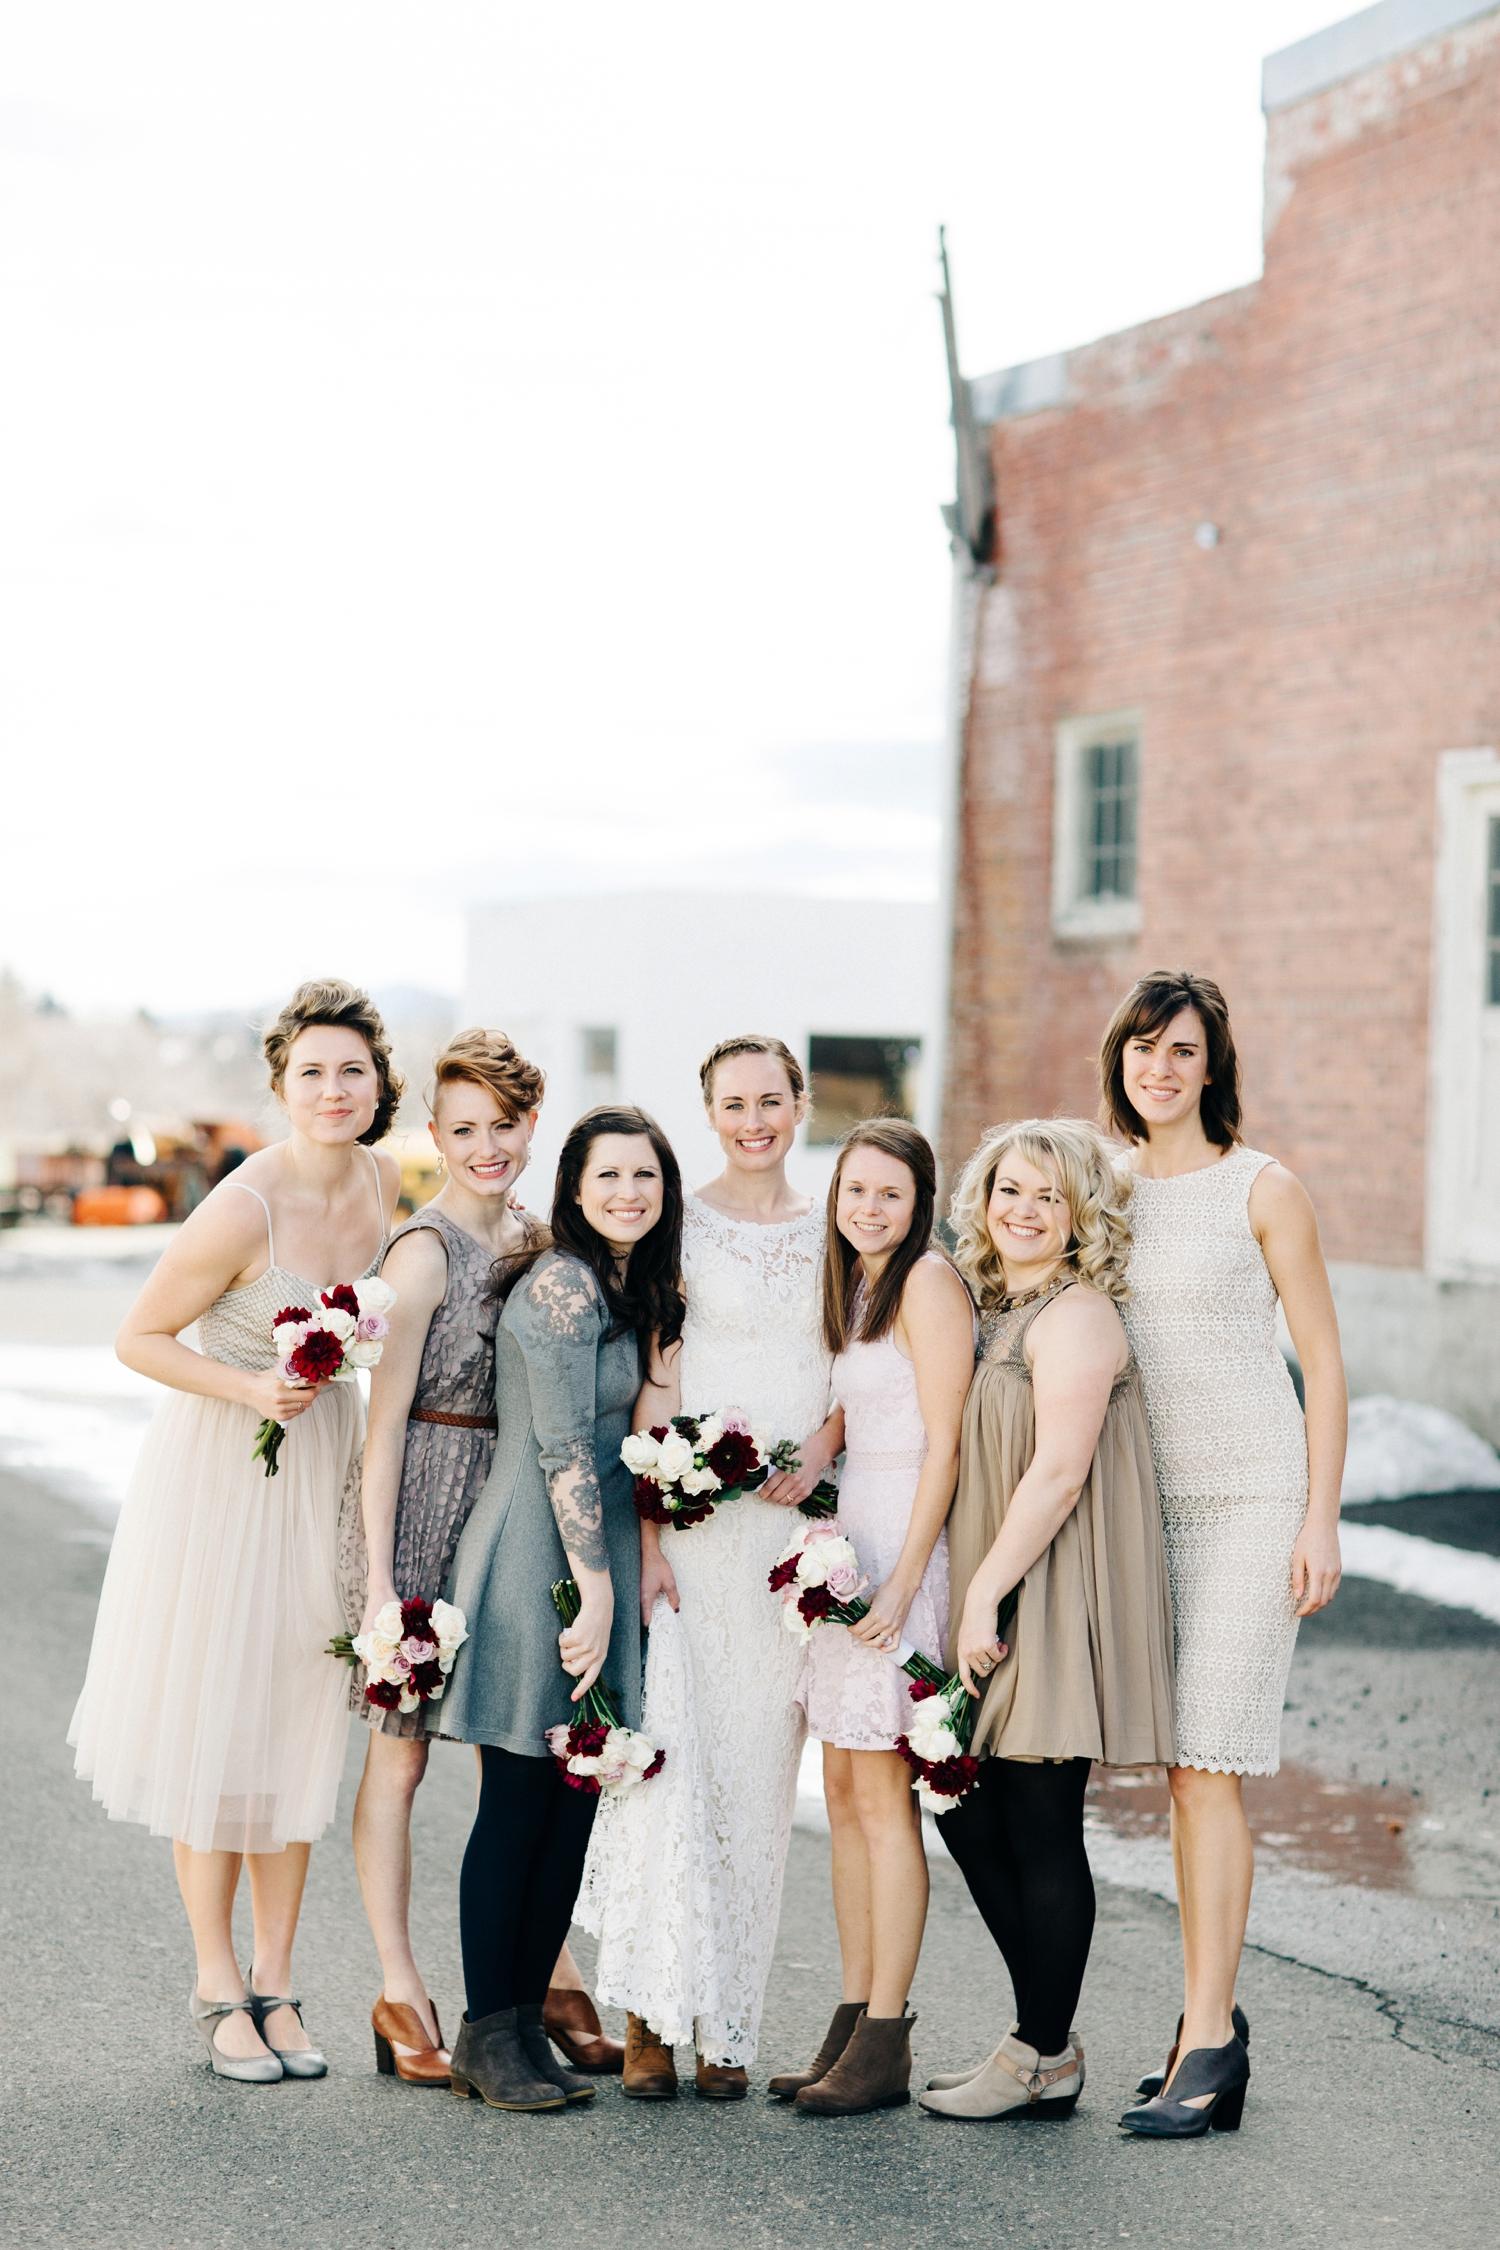 Mighty_Tieton_Yakima_Washington_Wedding_Photo_22.JPG